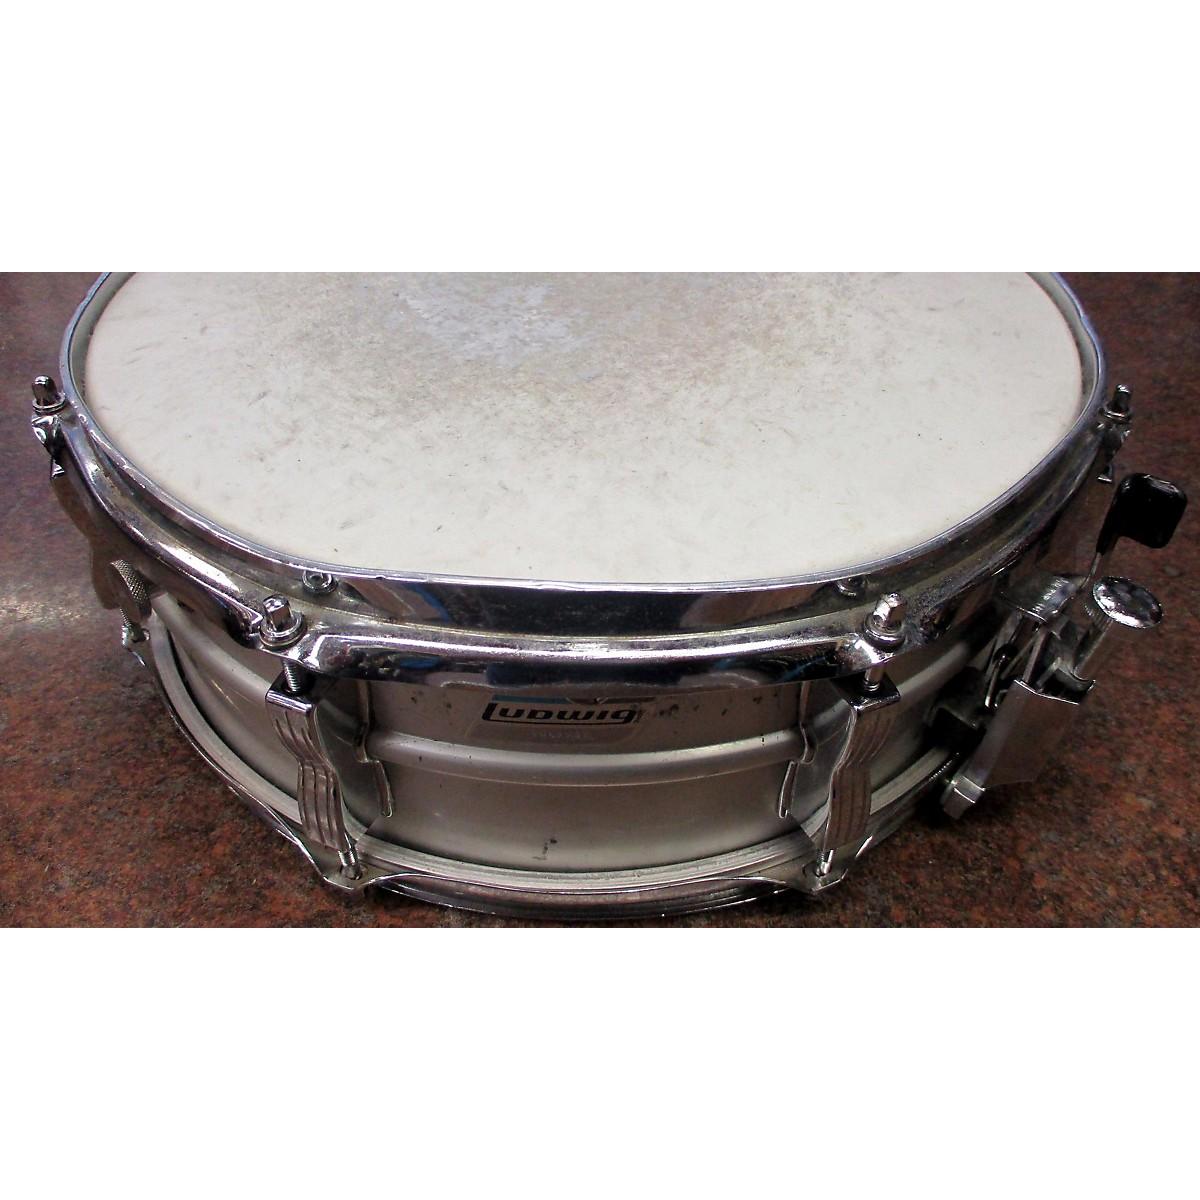 Ludwig 1970s 5X14 Acrolite Snare Drum